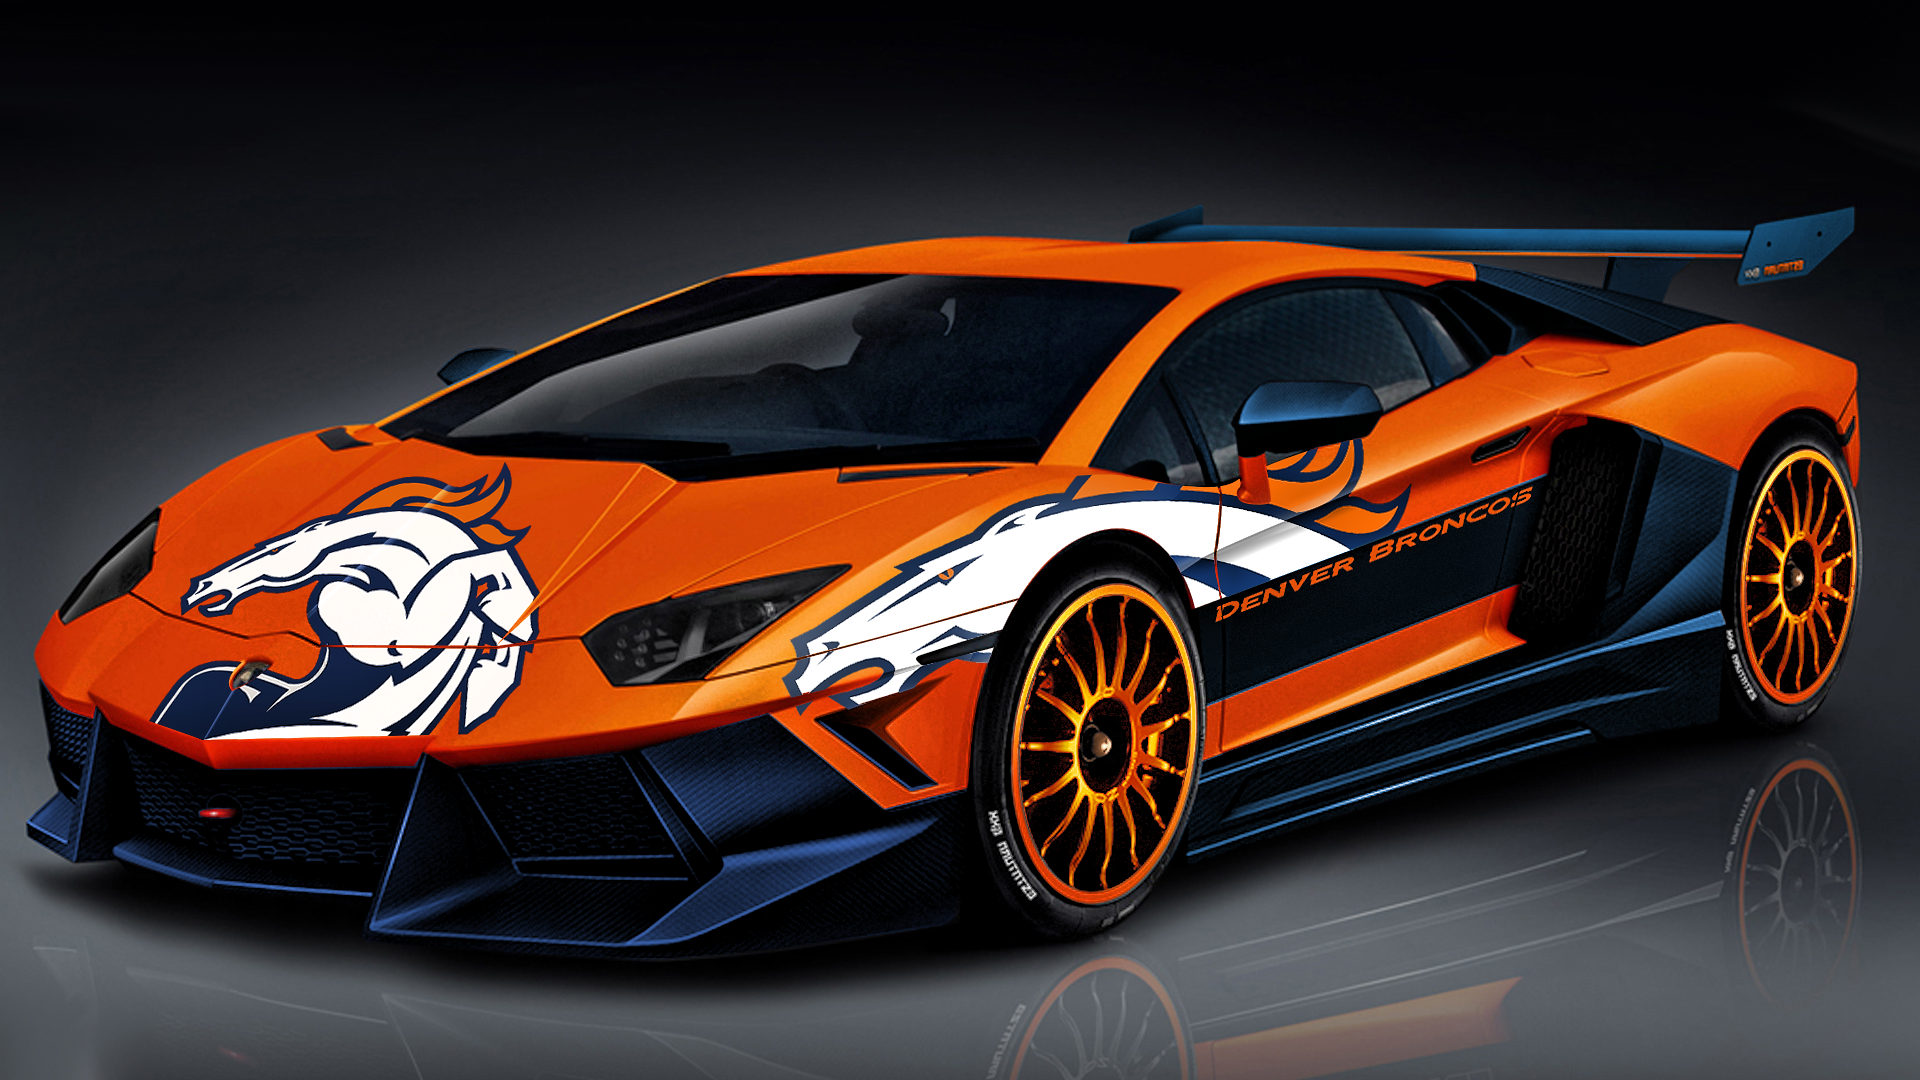 Broncos Lamborghini by DenverSportsWalls 1920x1080